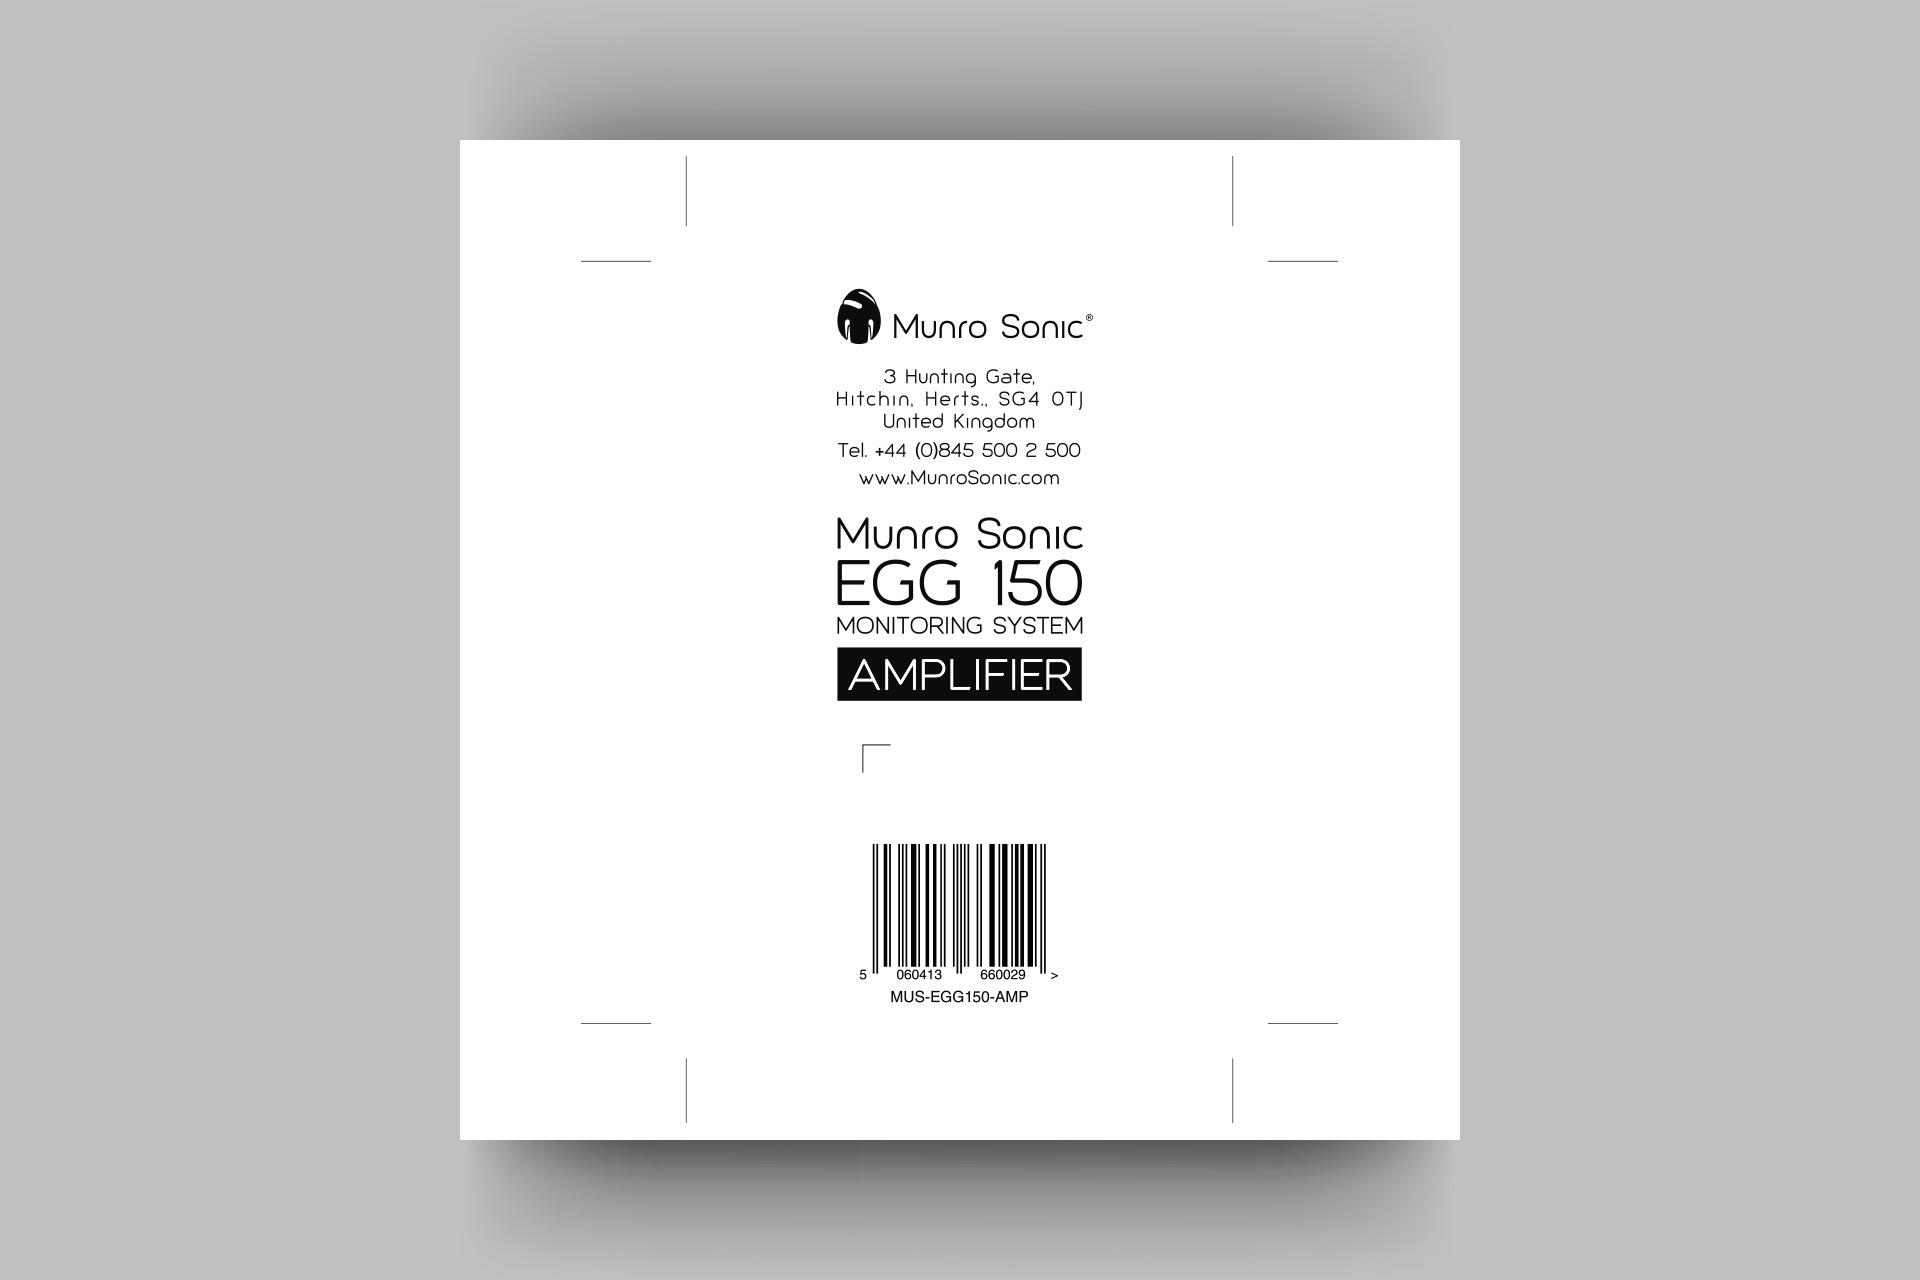 Munro-Sonic-label-amplifier